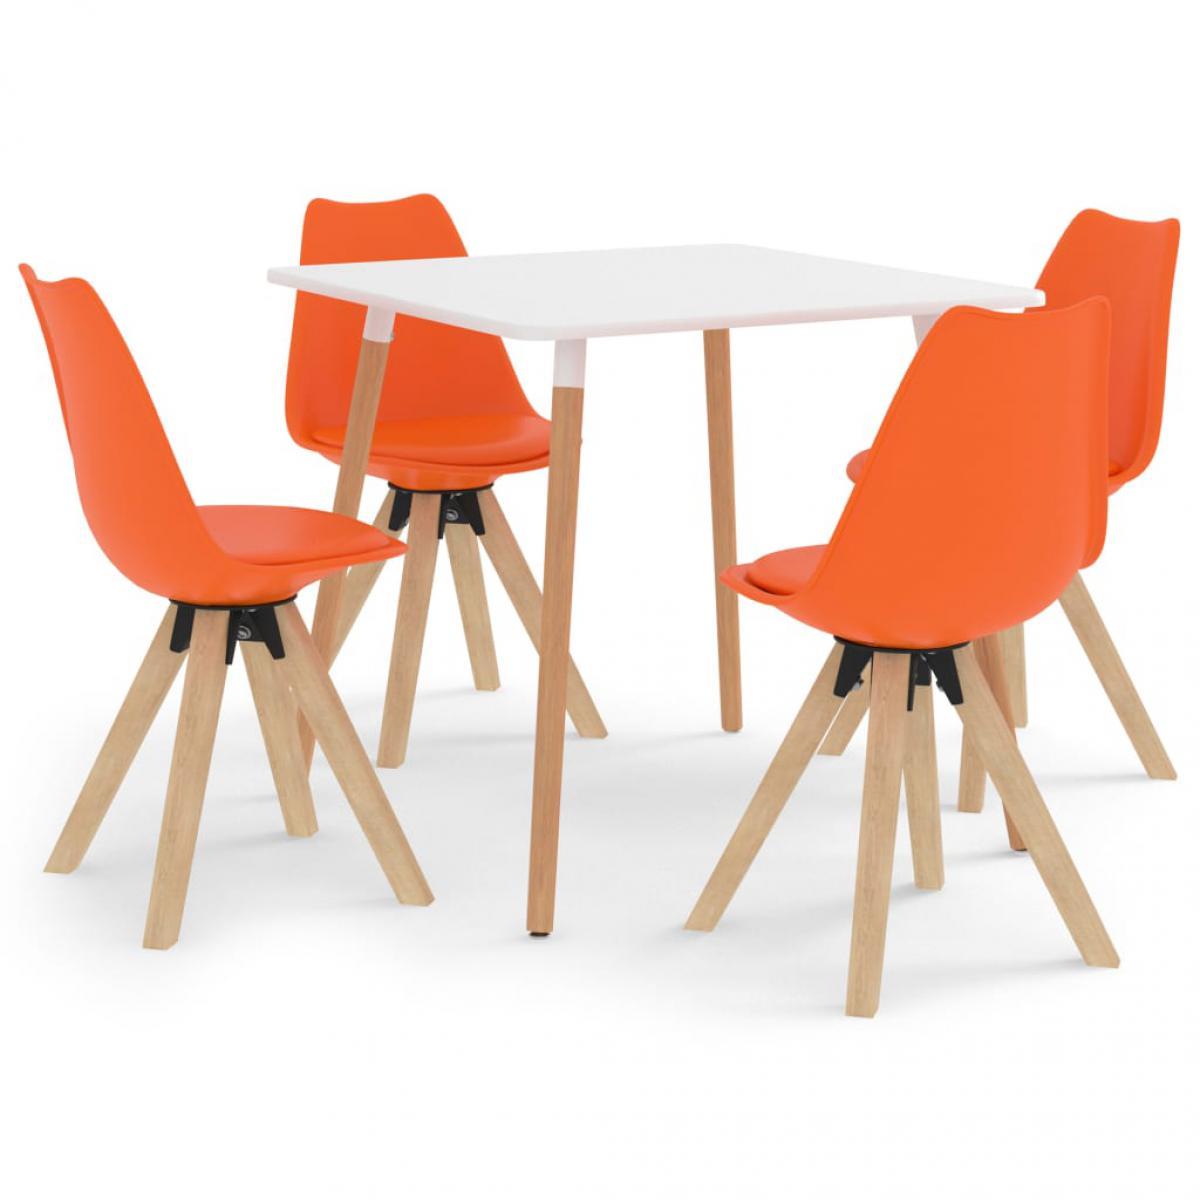 Vidaxl vidaXL Ensemble de salle à manger 5 pcs Orange